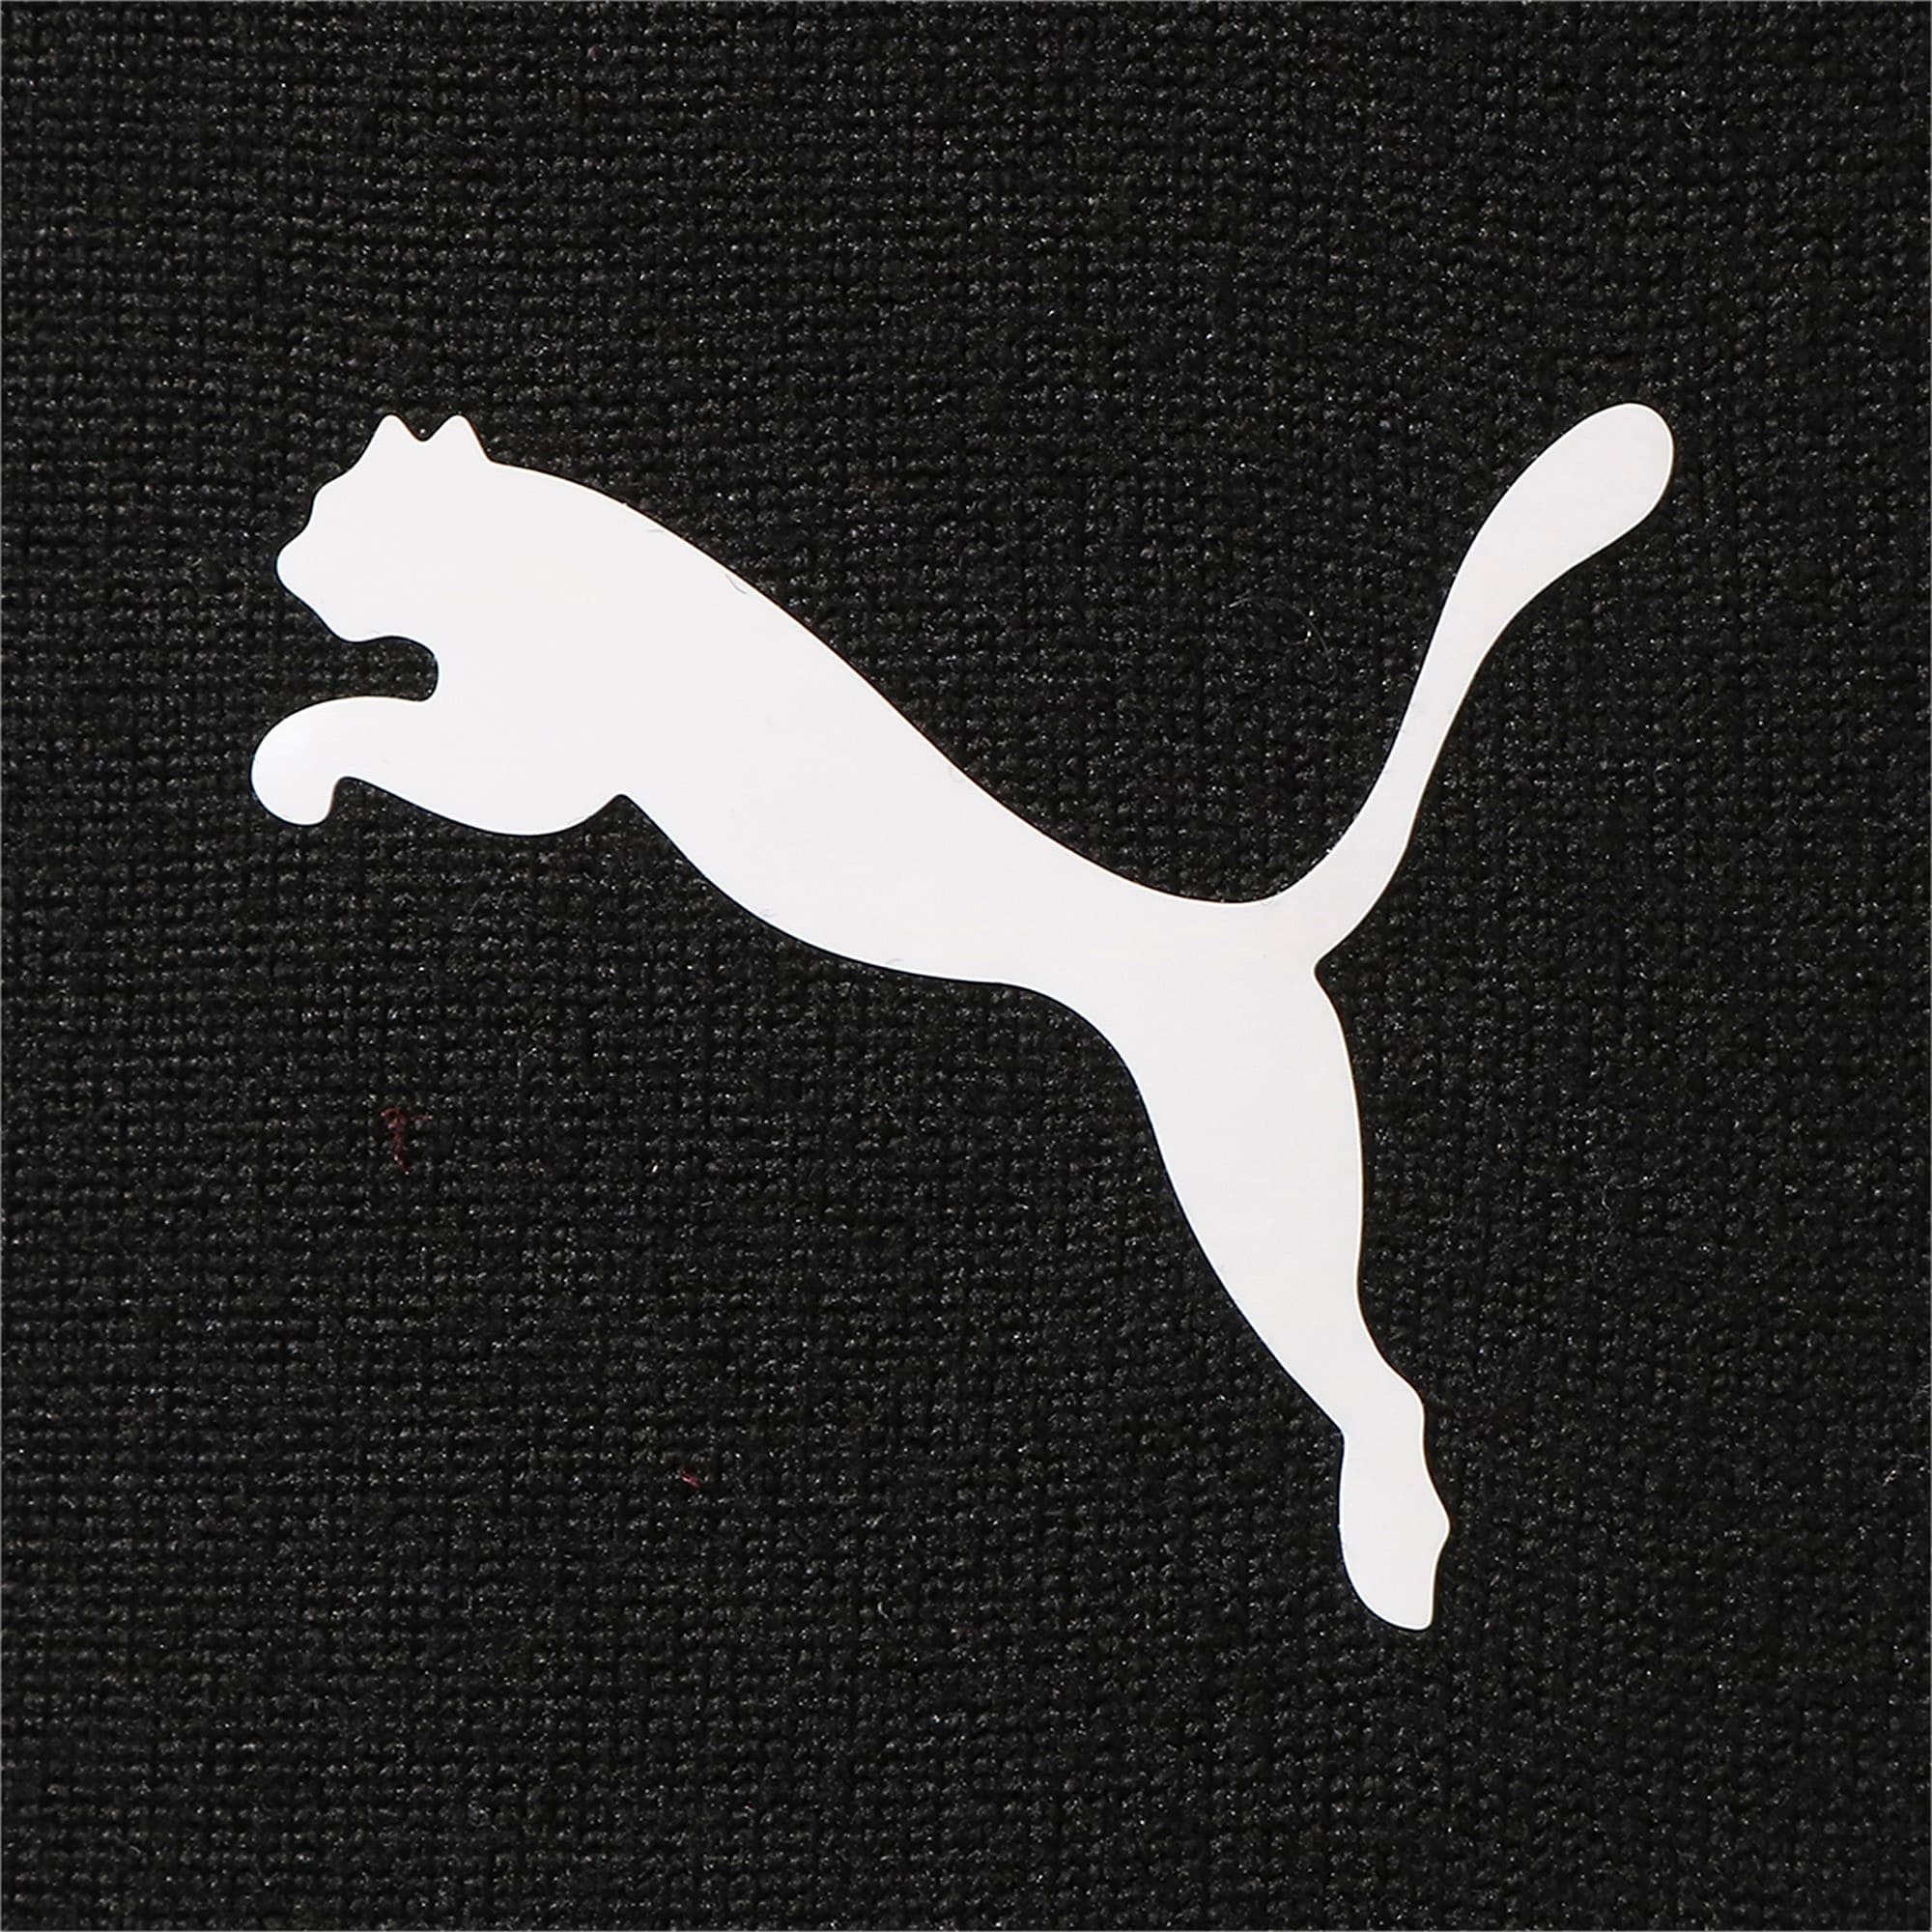 Thumbnail 7 of FAVORITE ロゴ ウィメンズ トレーニング 7/8 タイツ, Puma Black-Puma White, medium-JPN